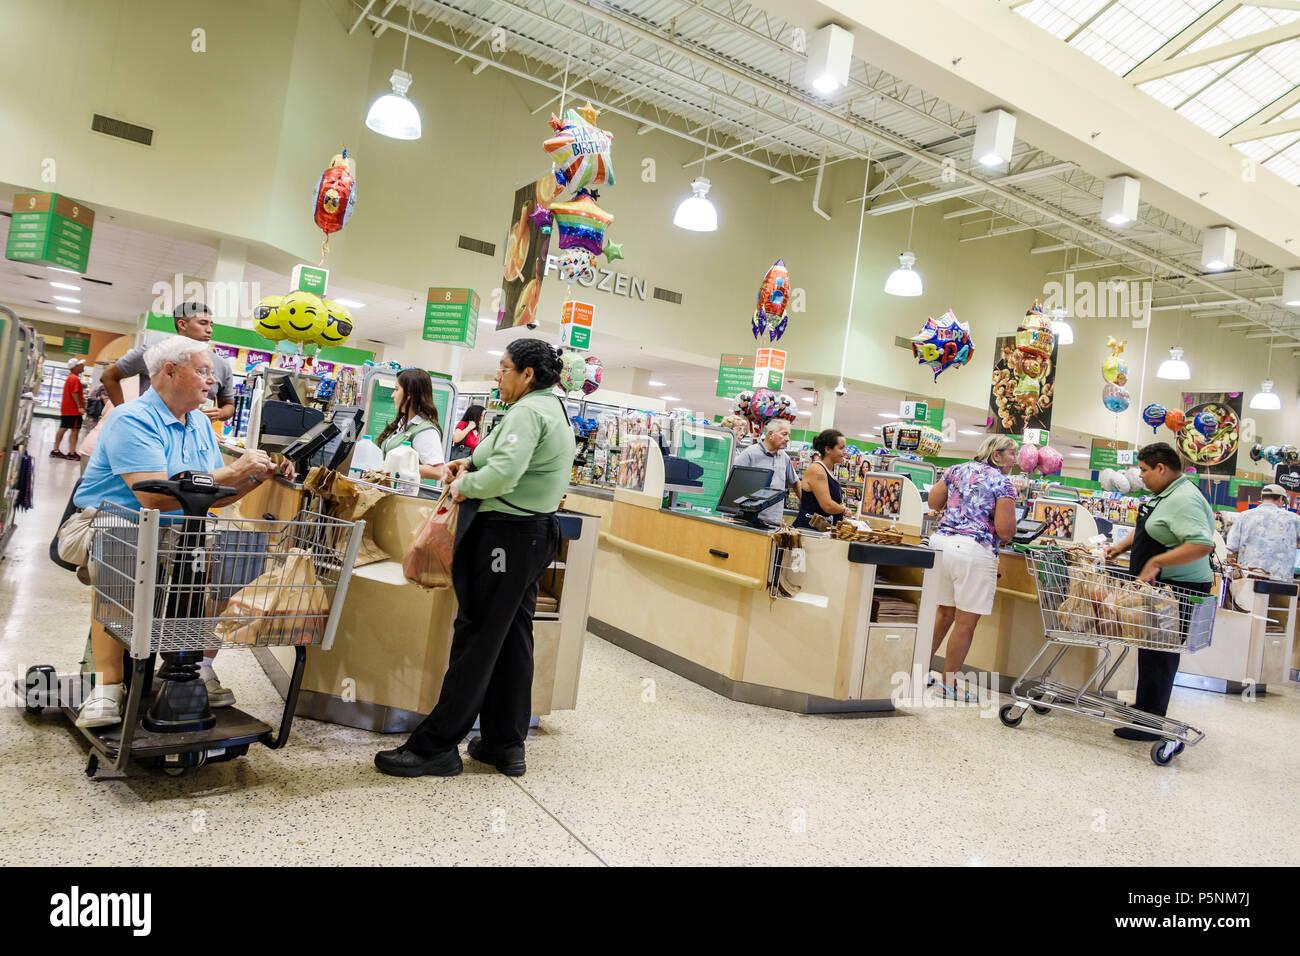 Naples Florida Publix Supermarkt Supermarkt elektrische Warenkorb gehbehindert Kassierer bagger Warenkorb Hispanic Mann Frau senior Custom Stockbild